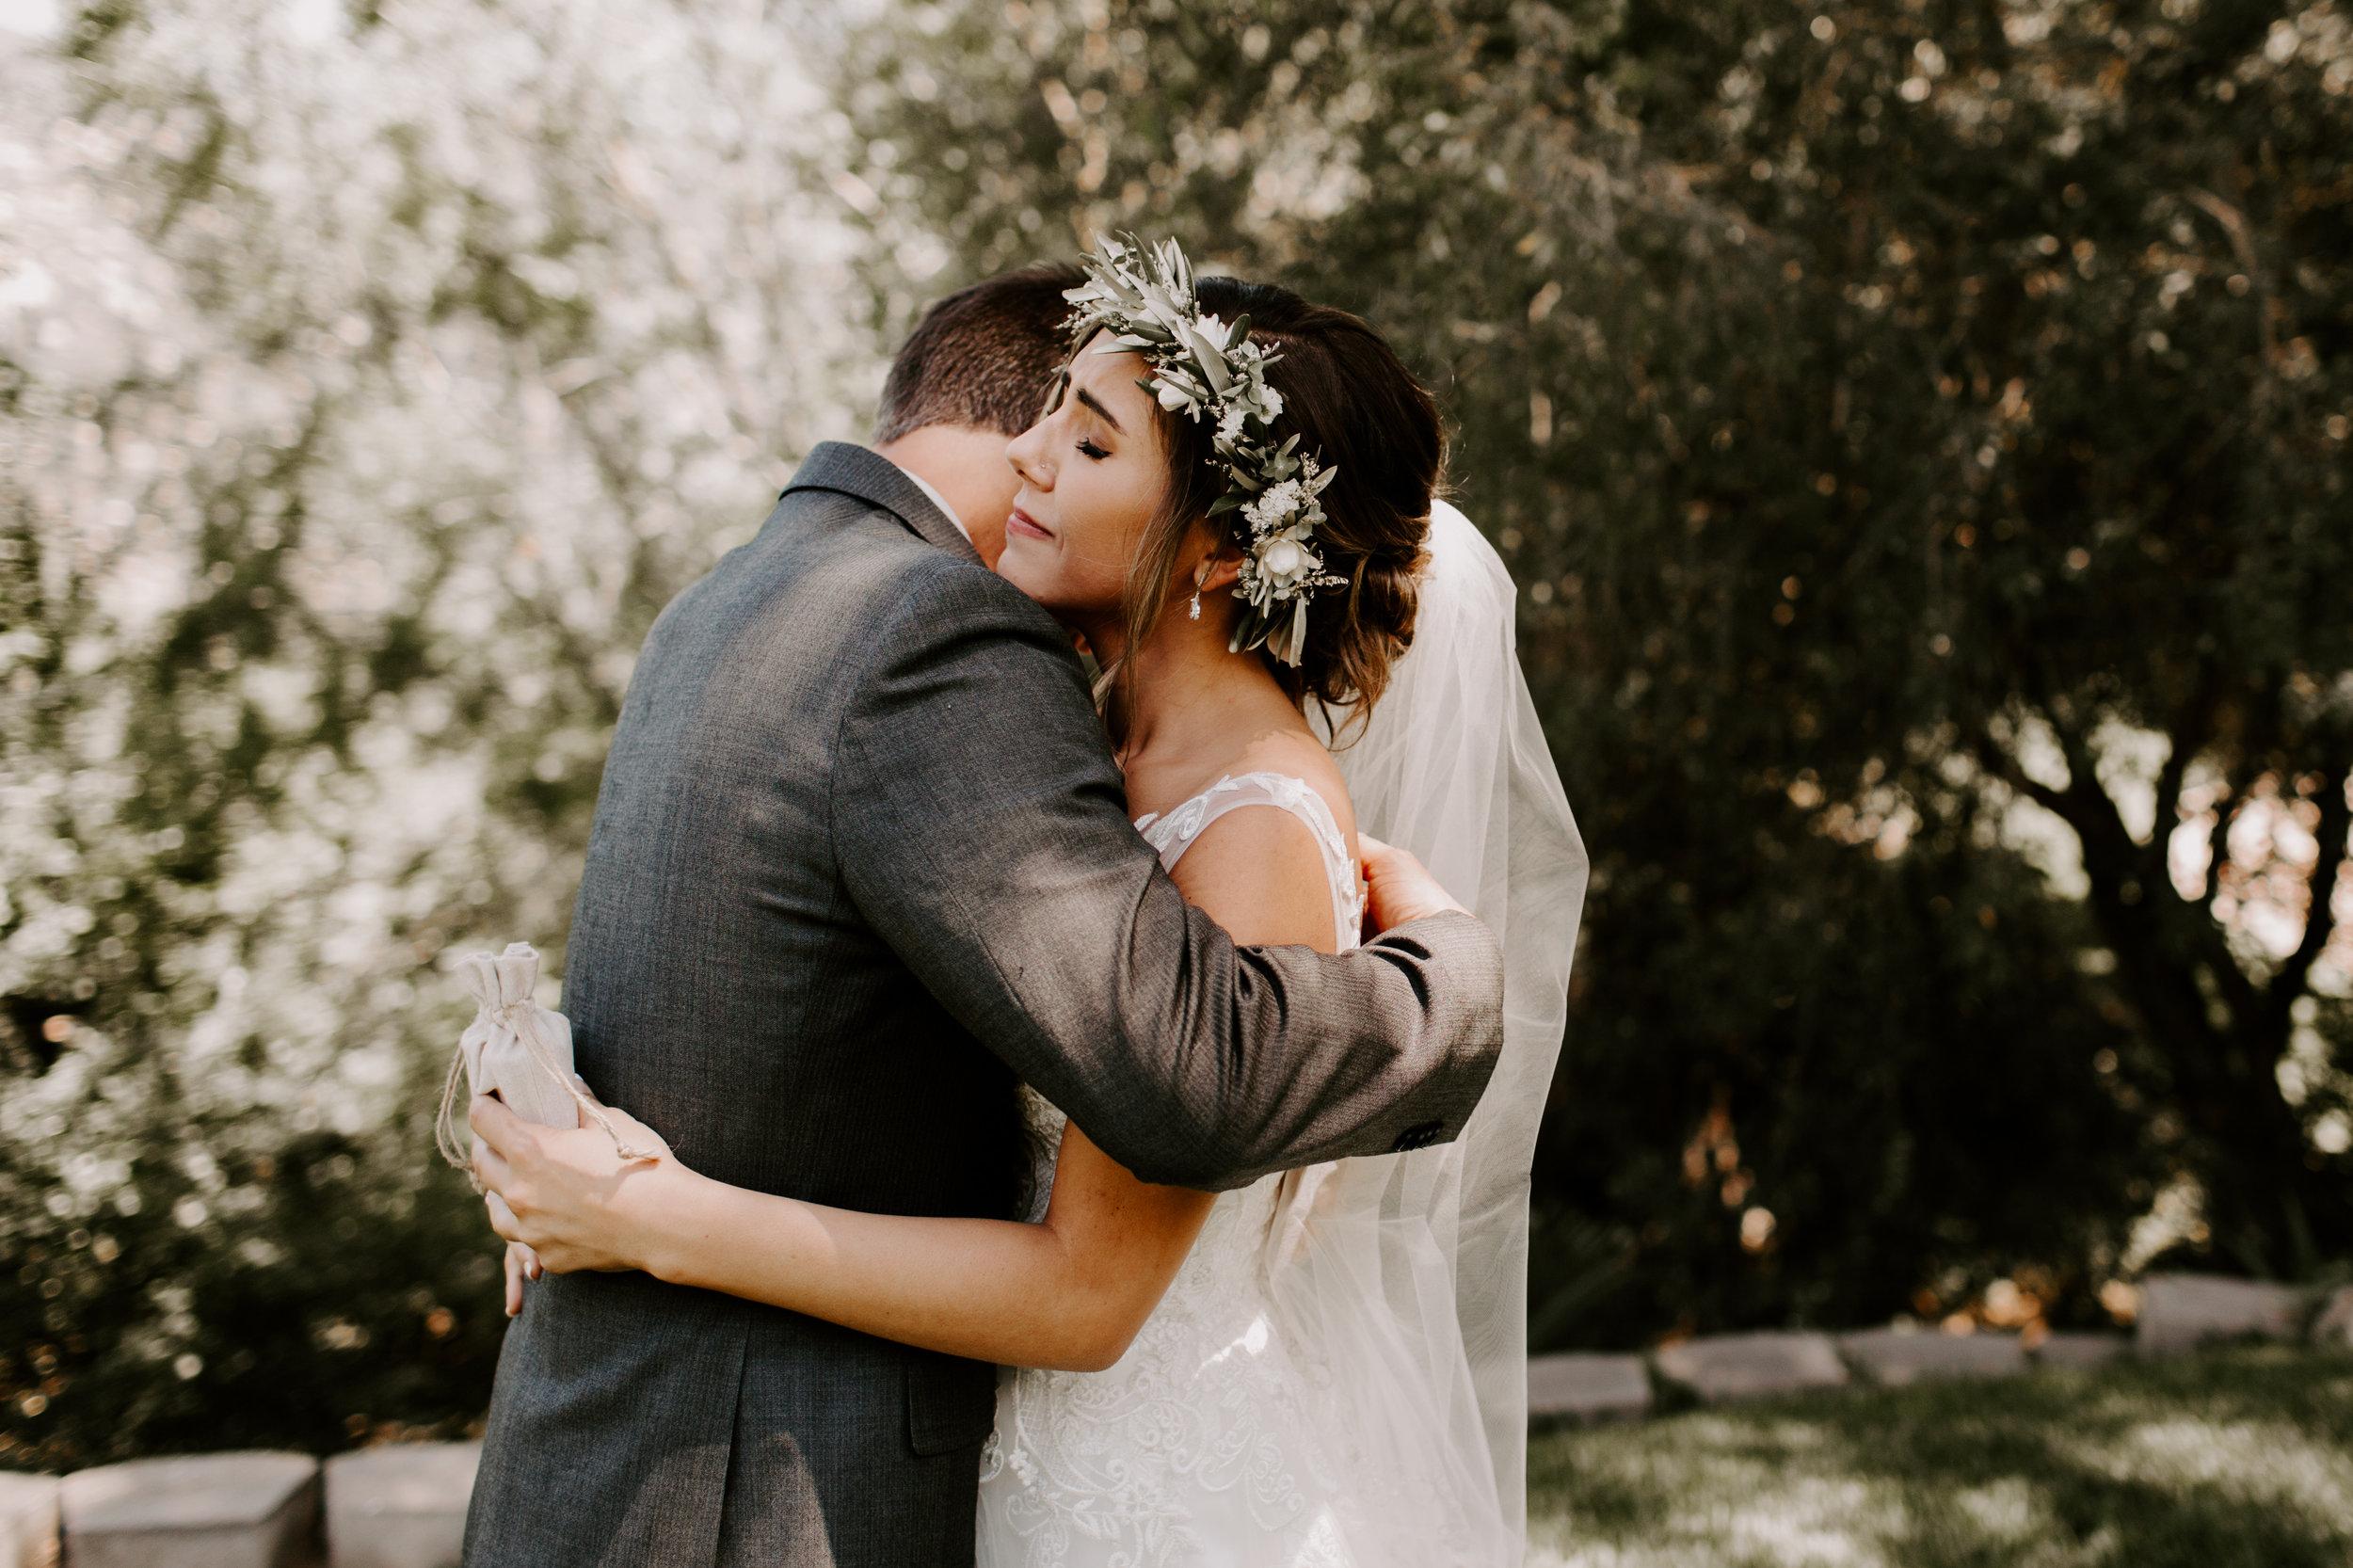 kate+zack_wedding_secludedgardenestate_temecula_madisonrylee_0143.jpg